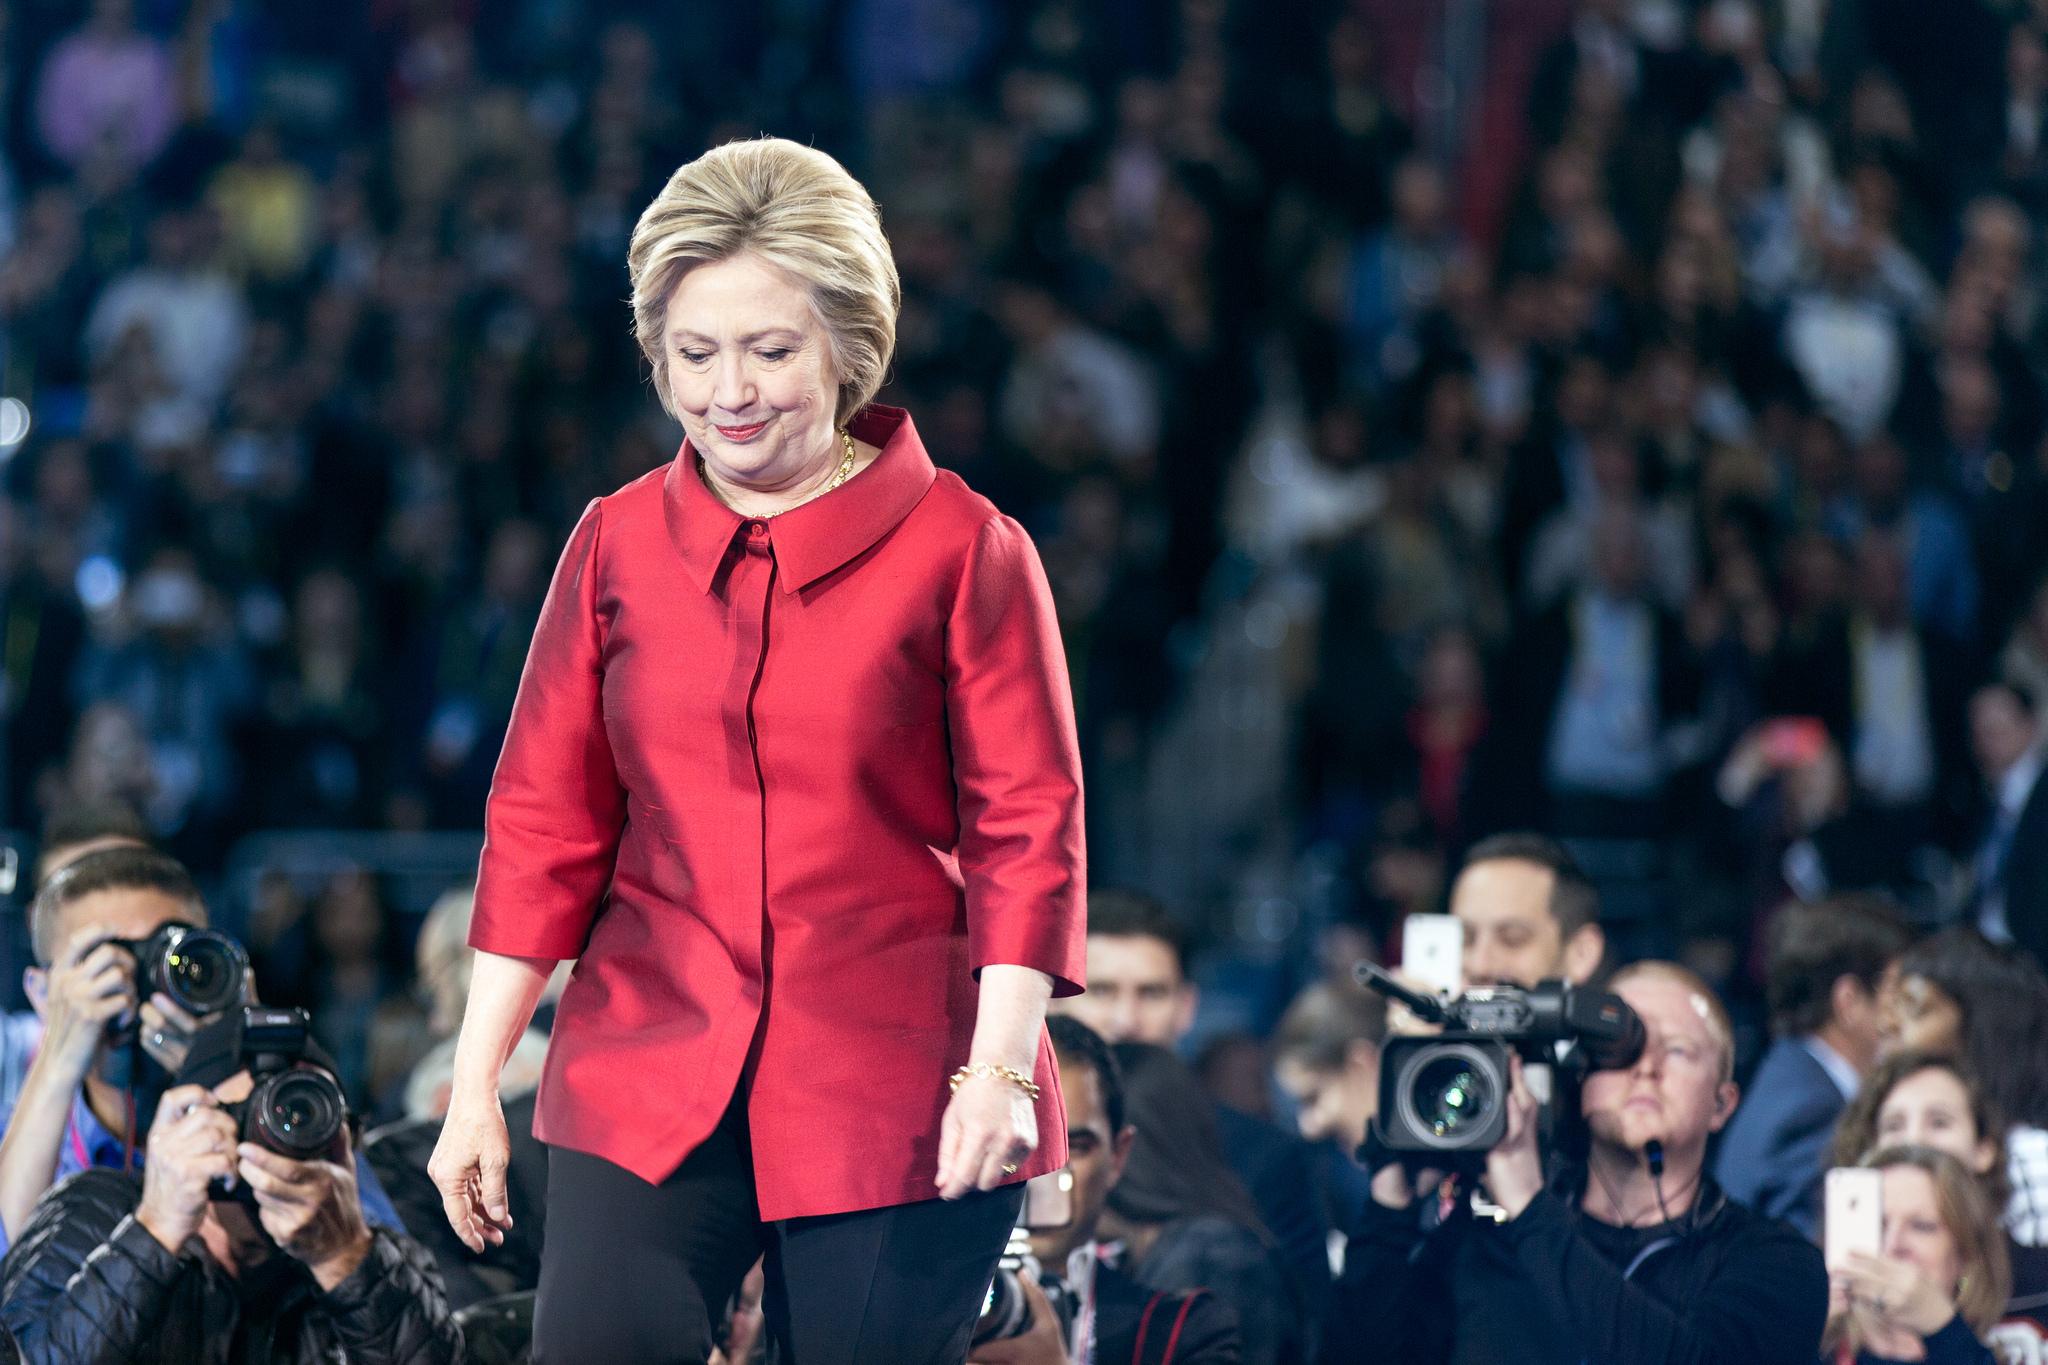 Hillary Clinton walks on stage at AIPAC, Washington DC